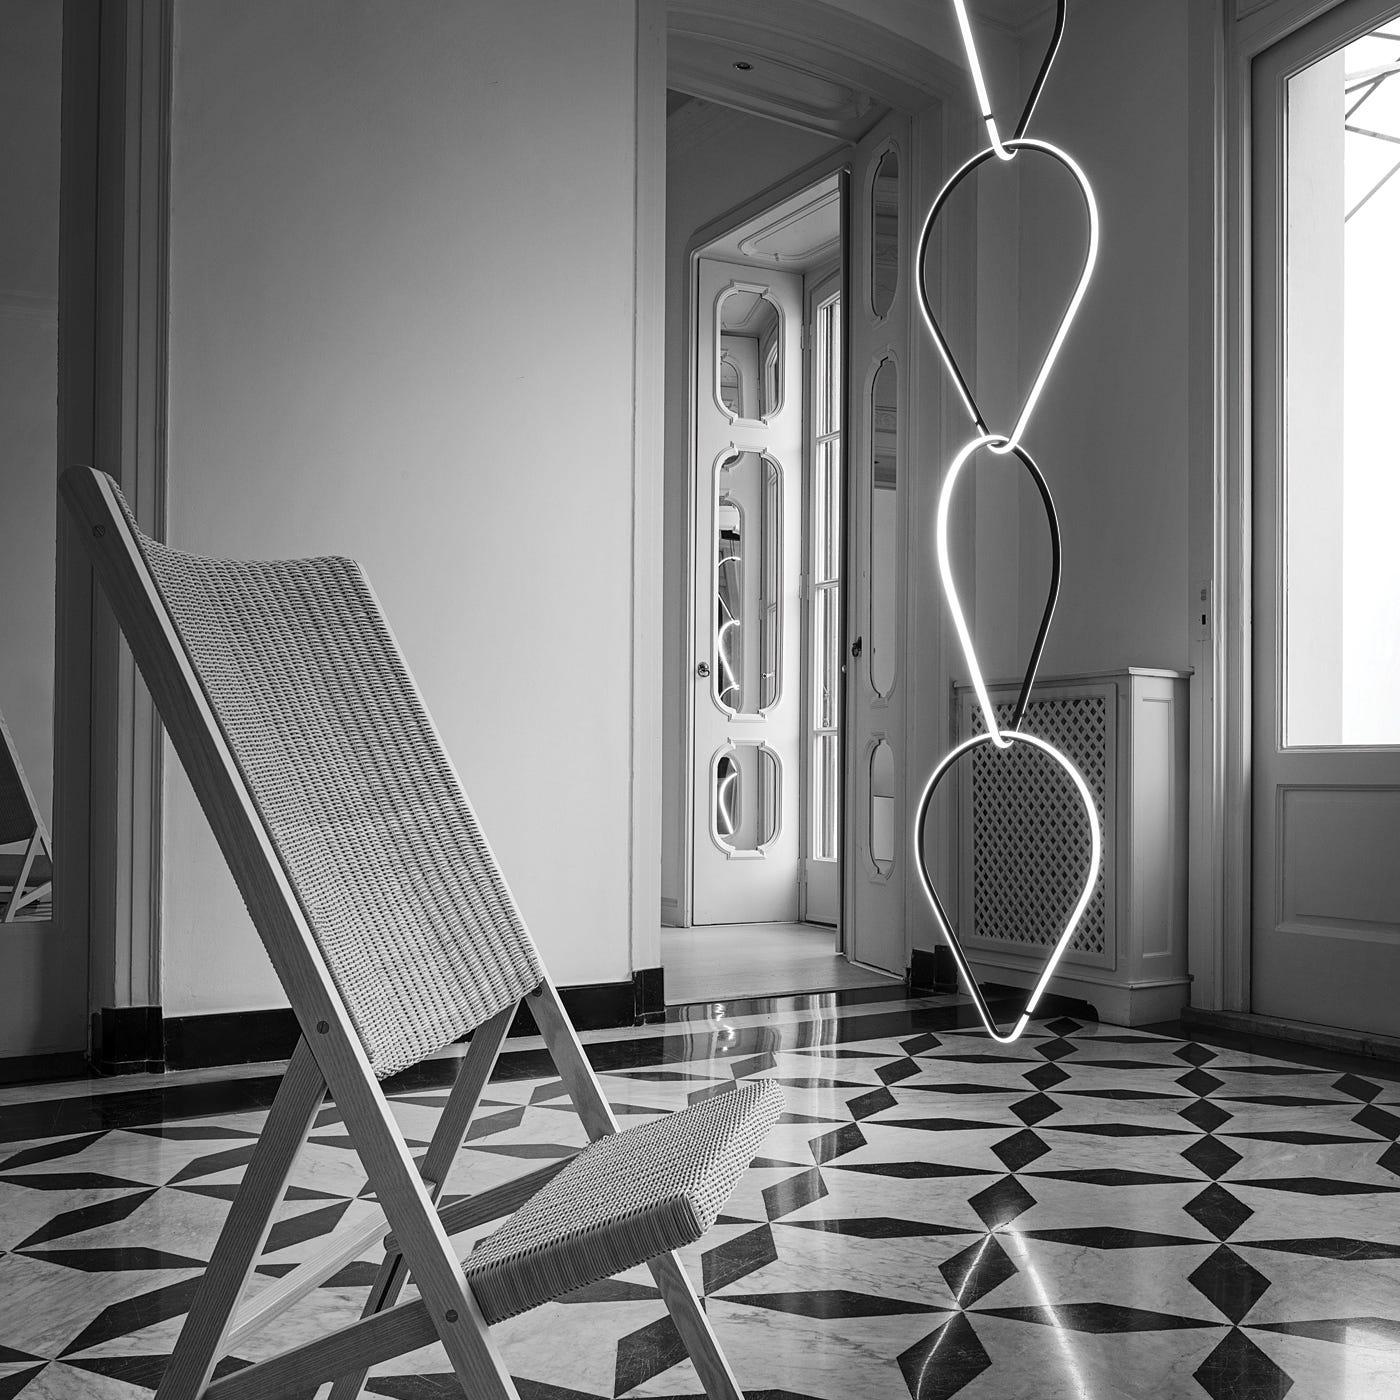 Arrangements teardrop composition ©Imagery by Santi Caleca